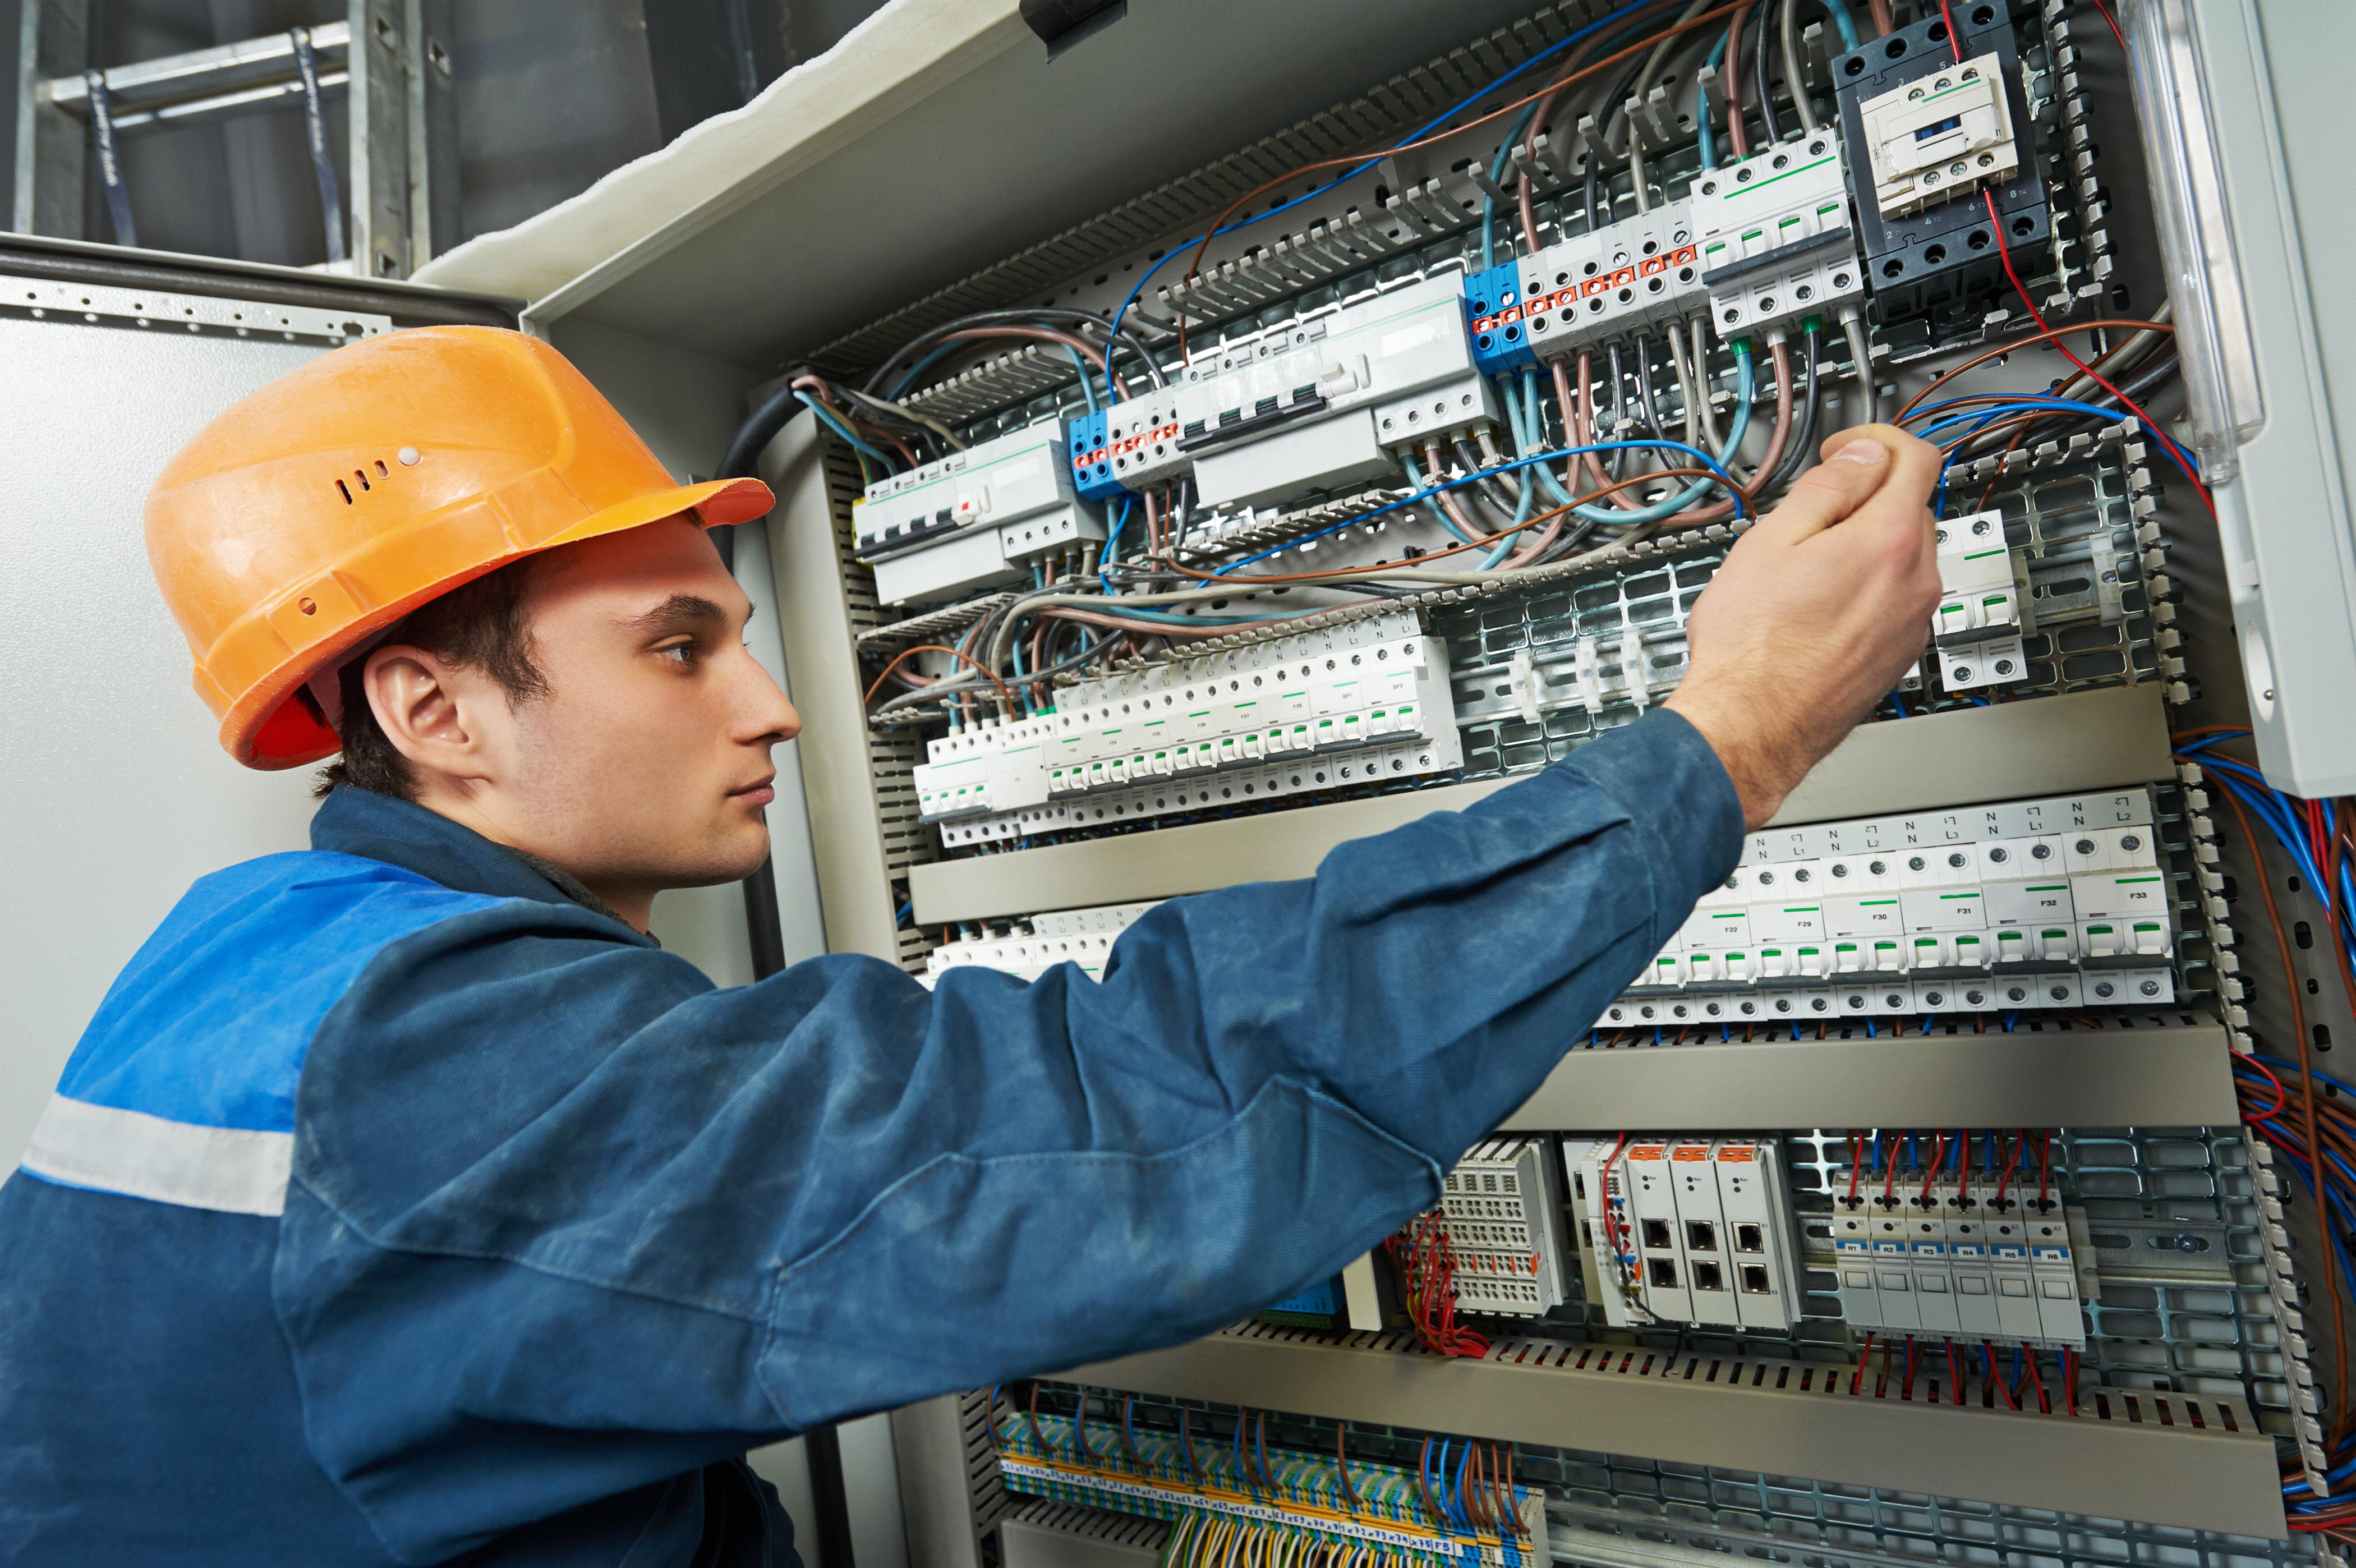 https://www.praxistraining.be/images/TRAININGEN2/ELEKTRICITEIT/elektriciteit-mekaniekers-opleiding.jpg